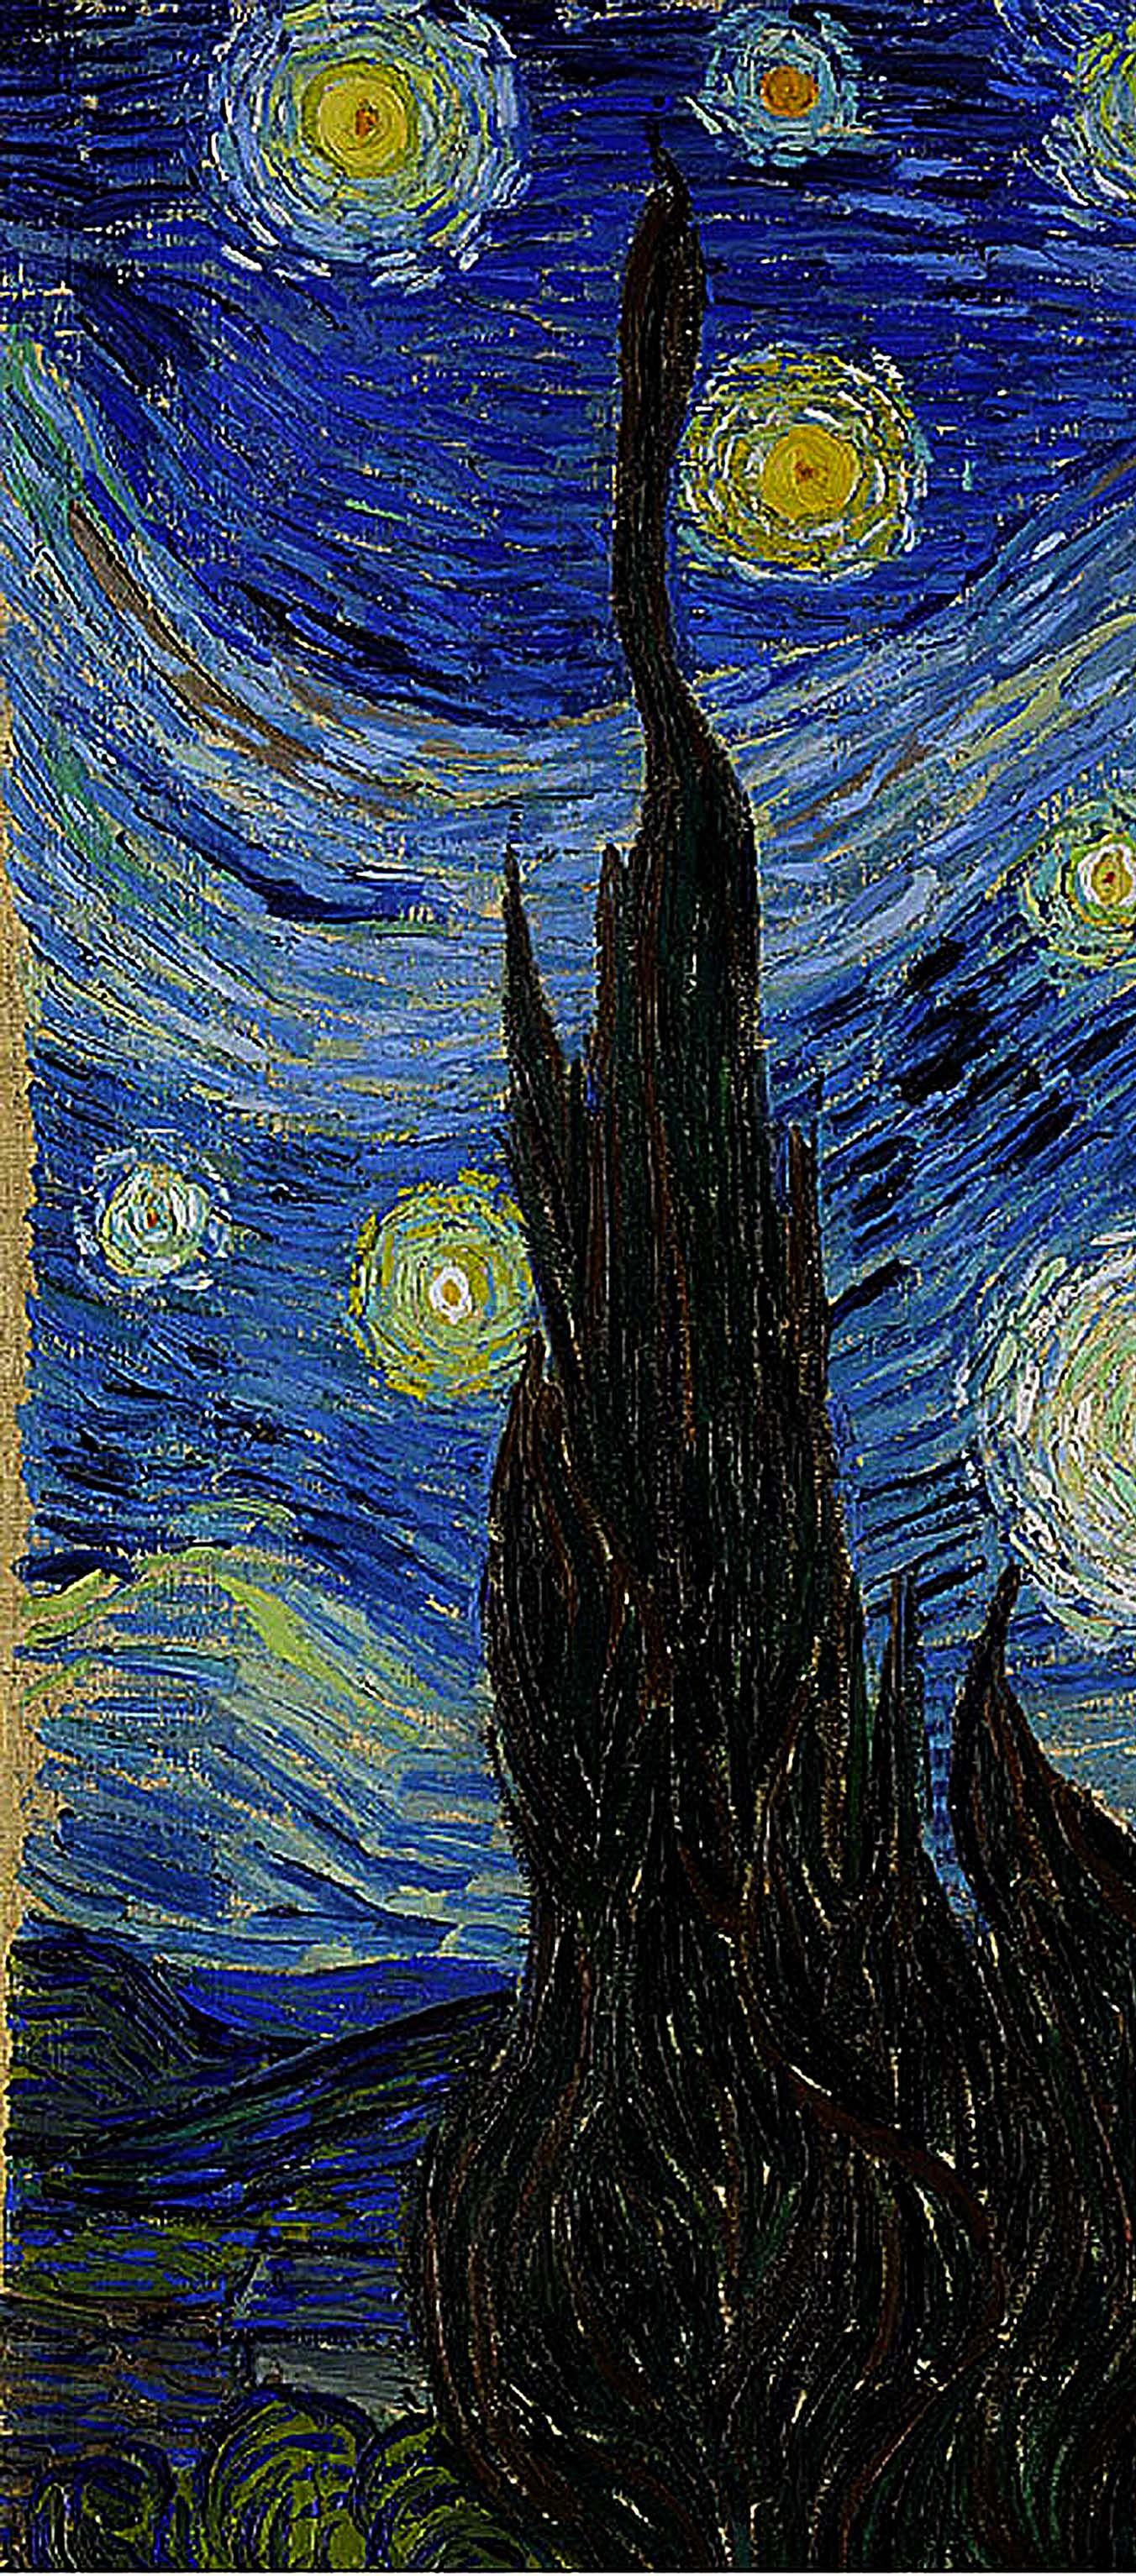 Vincent Van Gogh Starry Night Detail Left Obras De Arte Pintura De Arte Fondo De Arte